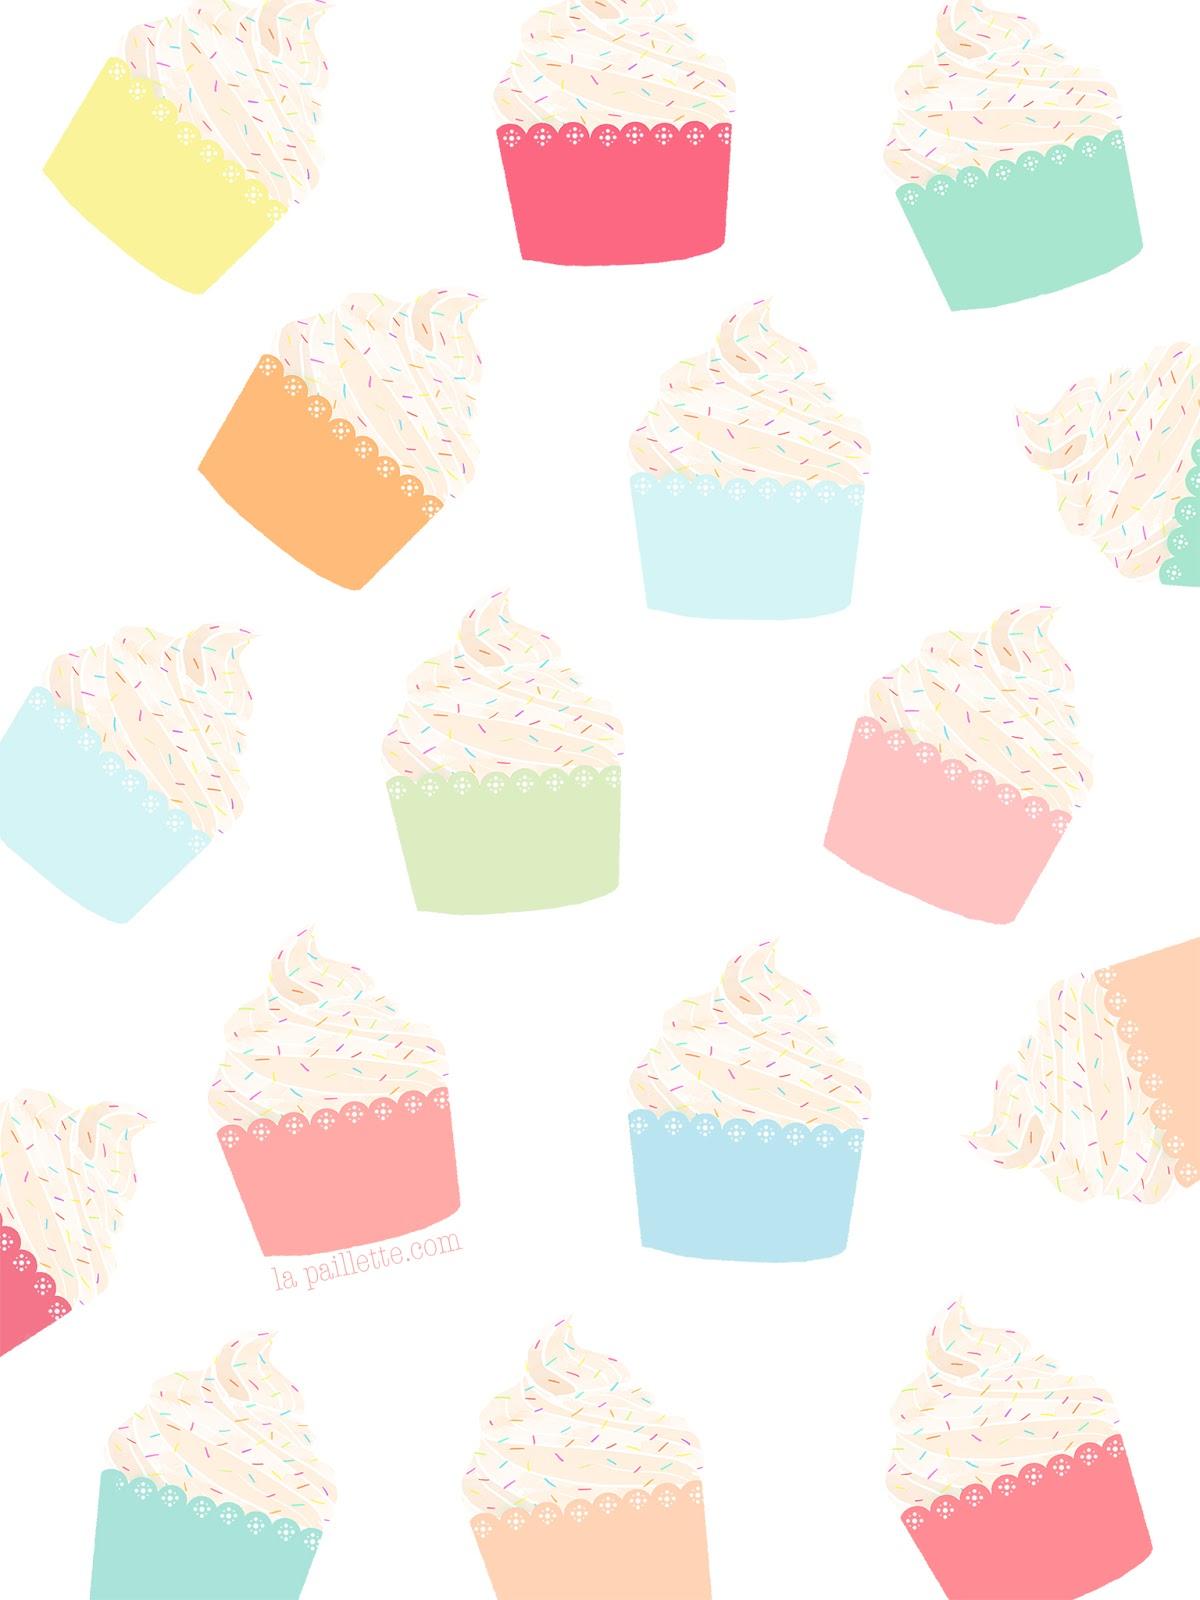 fonds d 39 cran cupcakes mac iphone ipad la paillette blog rennes claire illustratrice. Black Bedroom Furniture Sets. Home Design Ideas